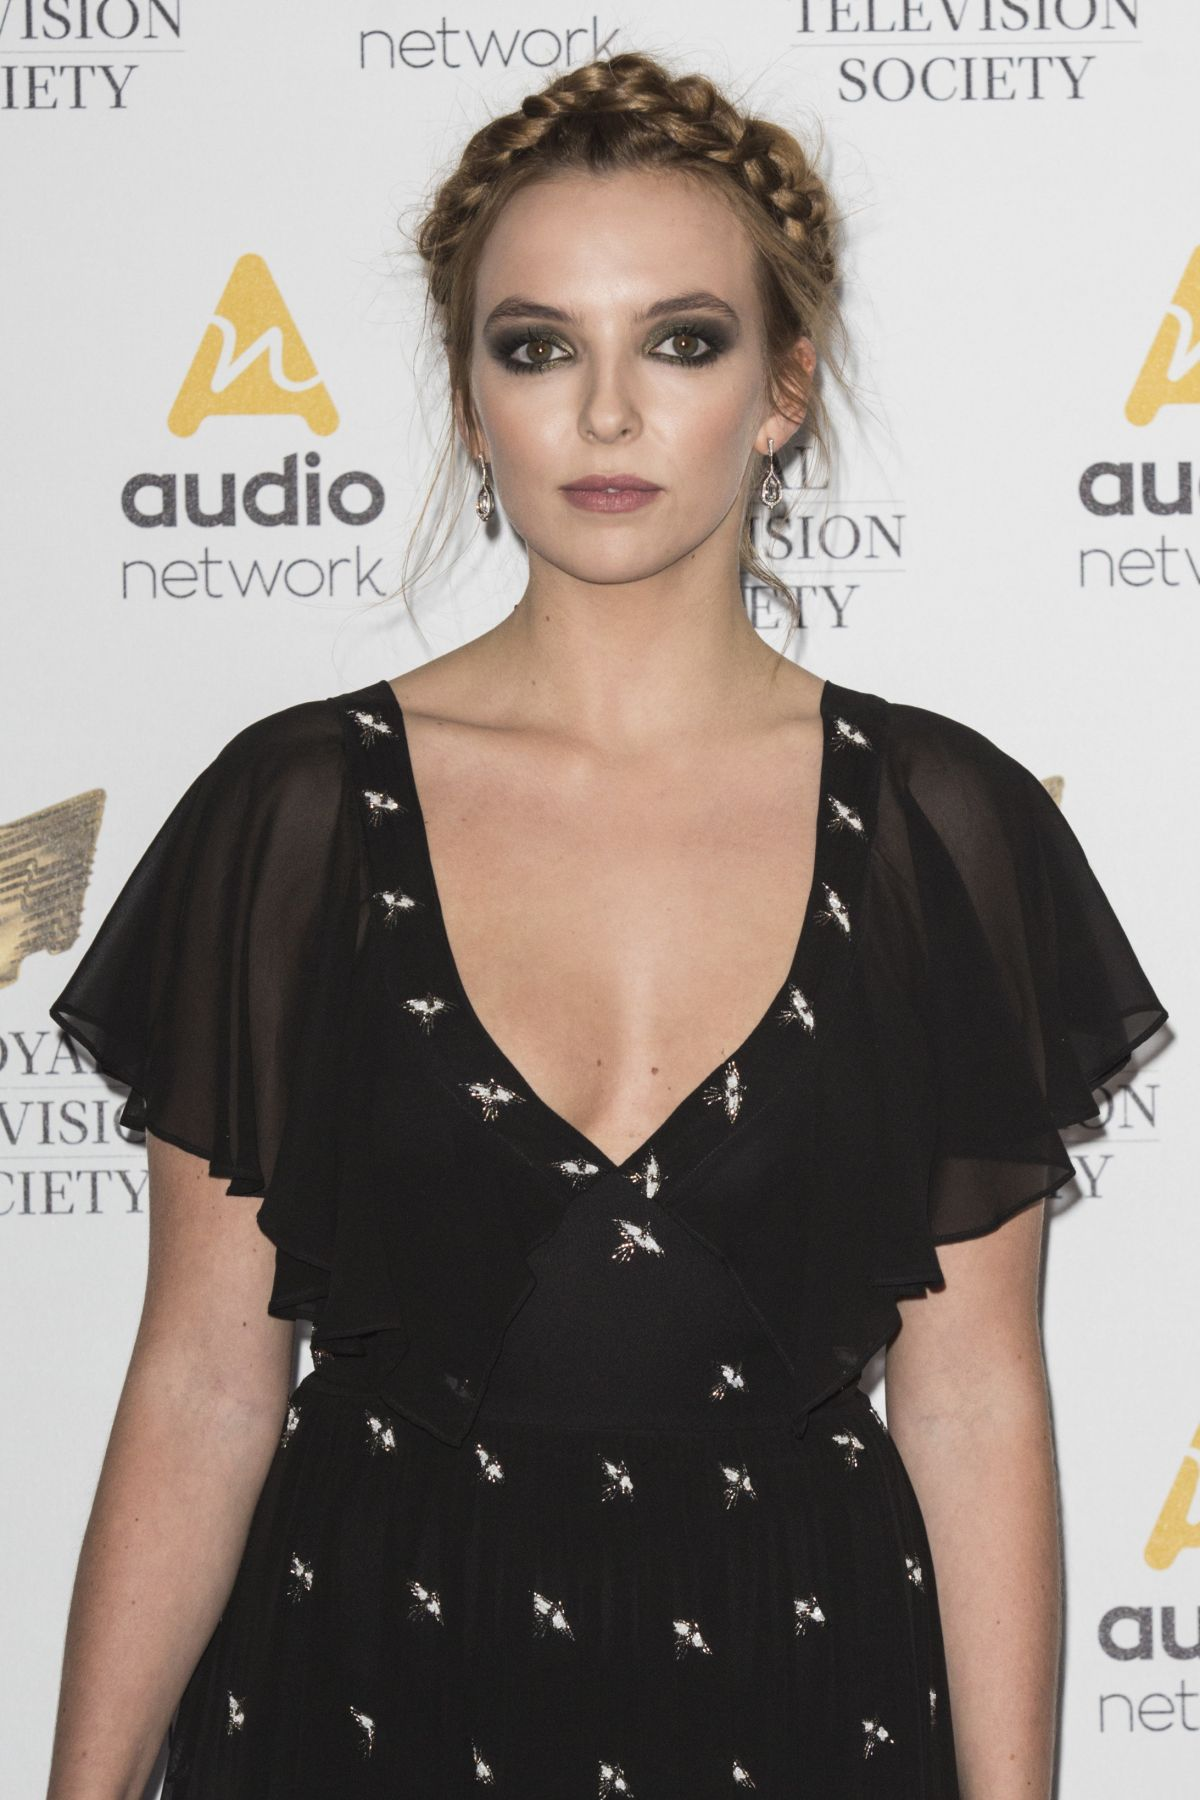 JODIE COMER at Royal Television Society Programme Awards in London 03/21/2017